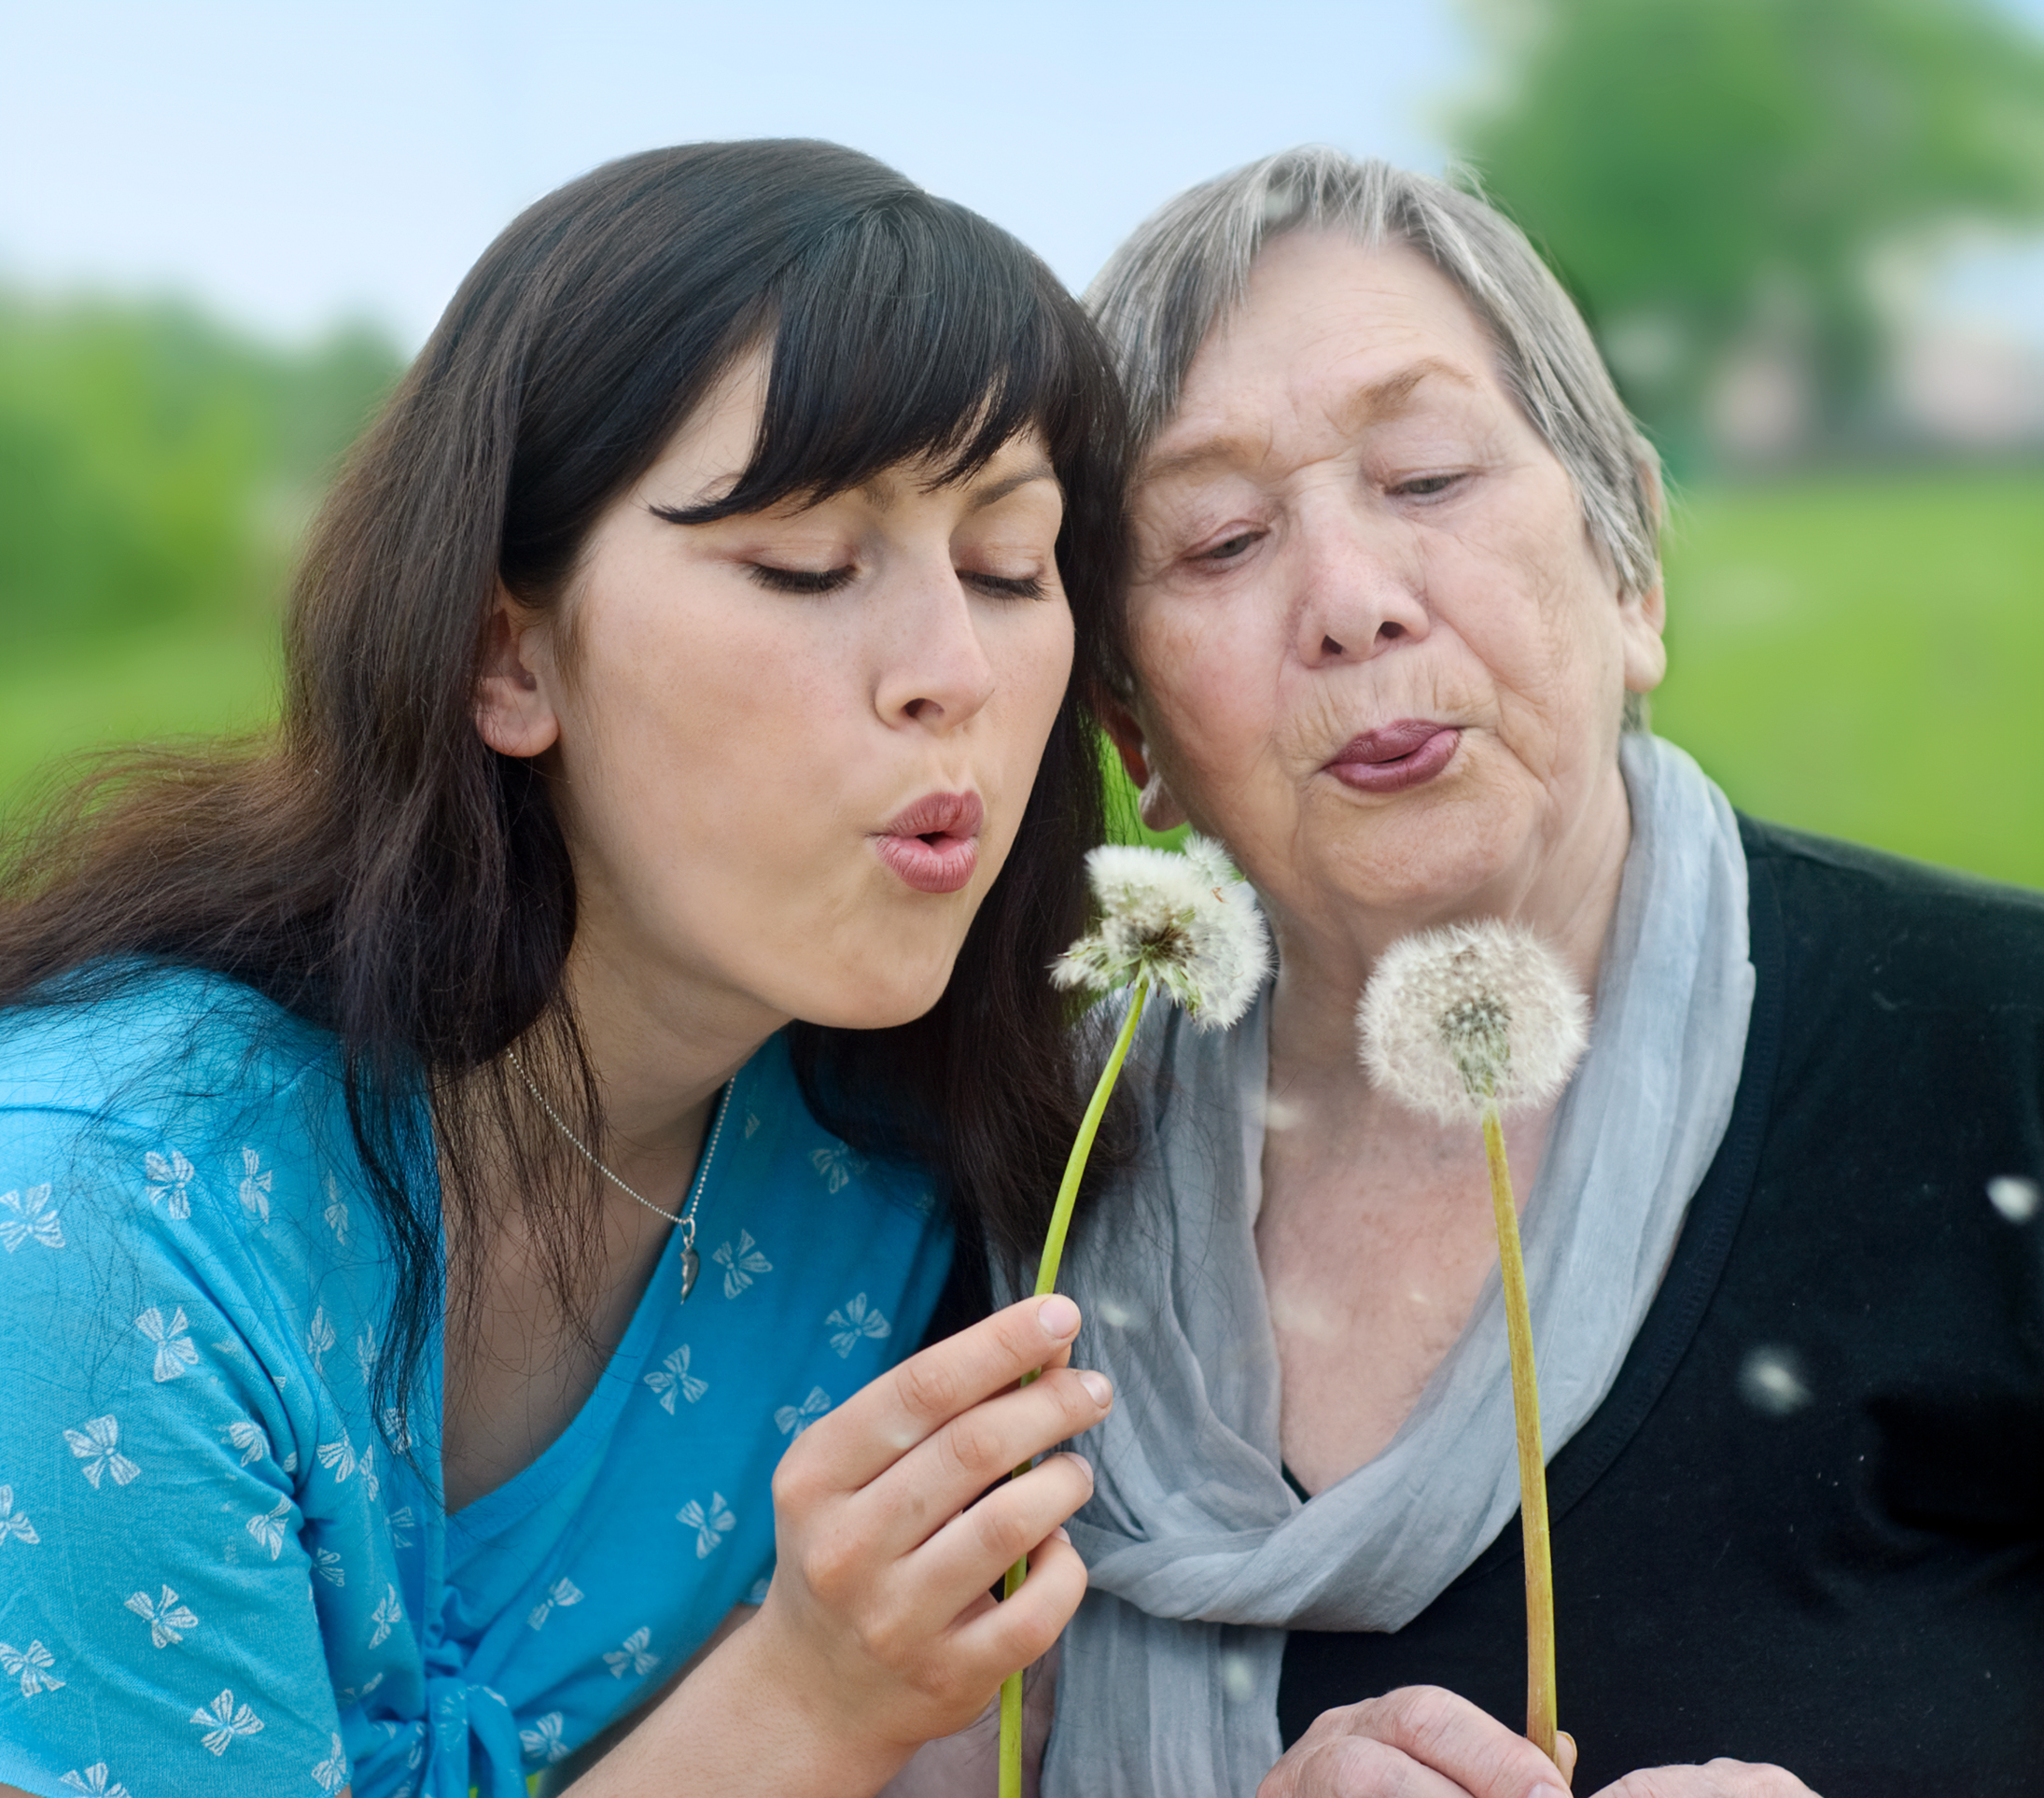 Aging in Harmony